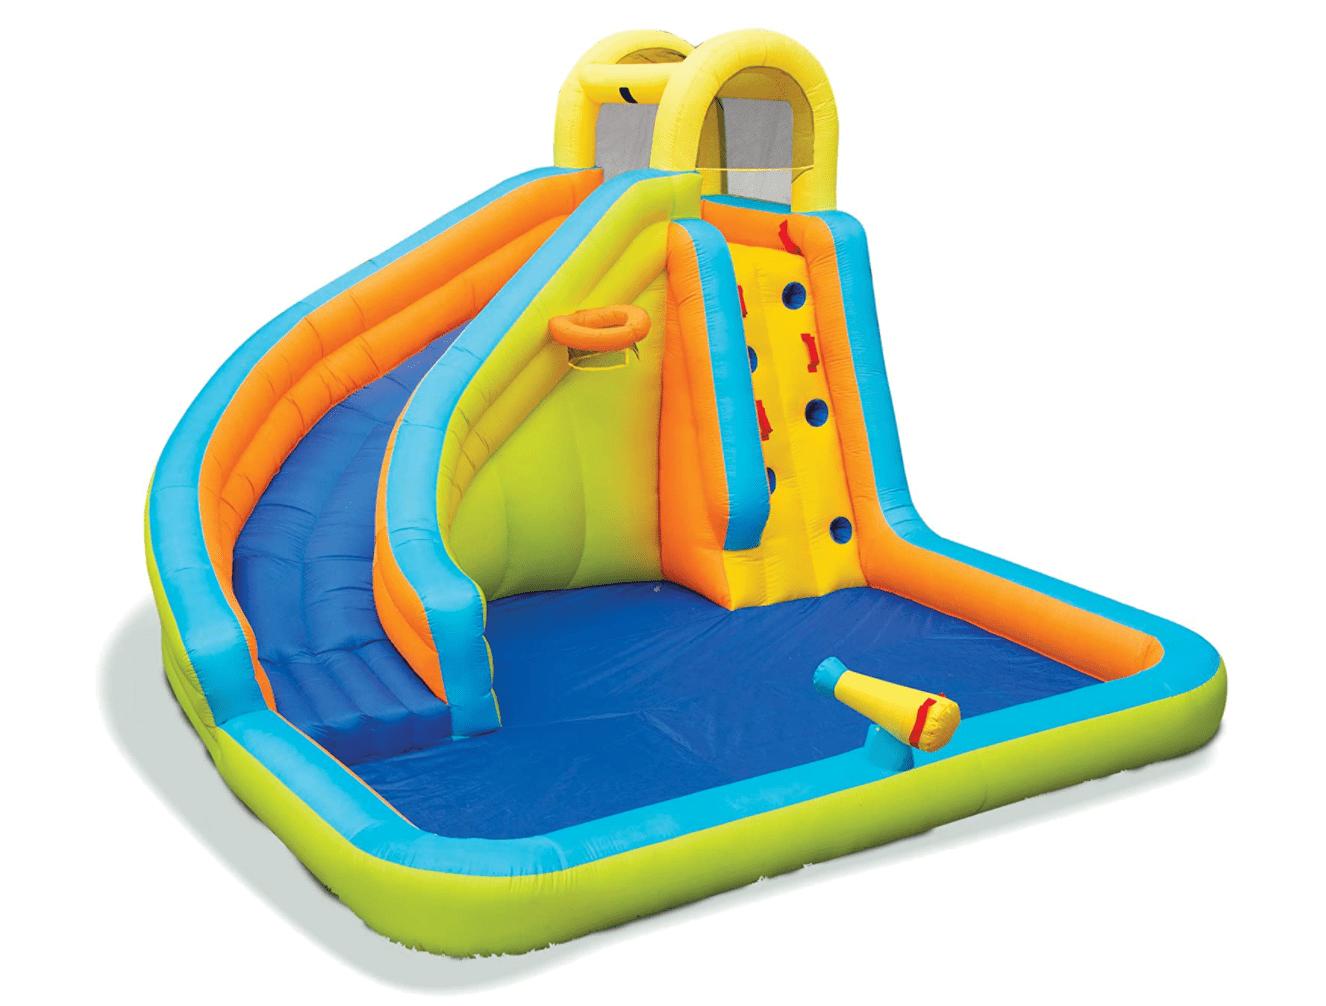 Banzai Backyard Inflatable Water Slide Park